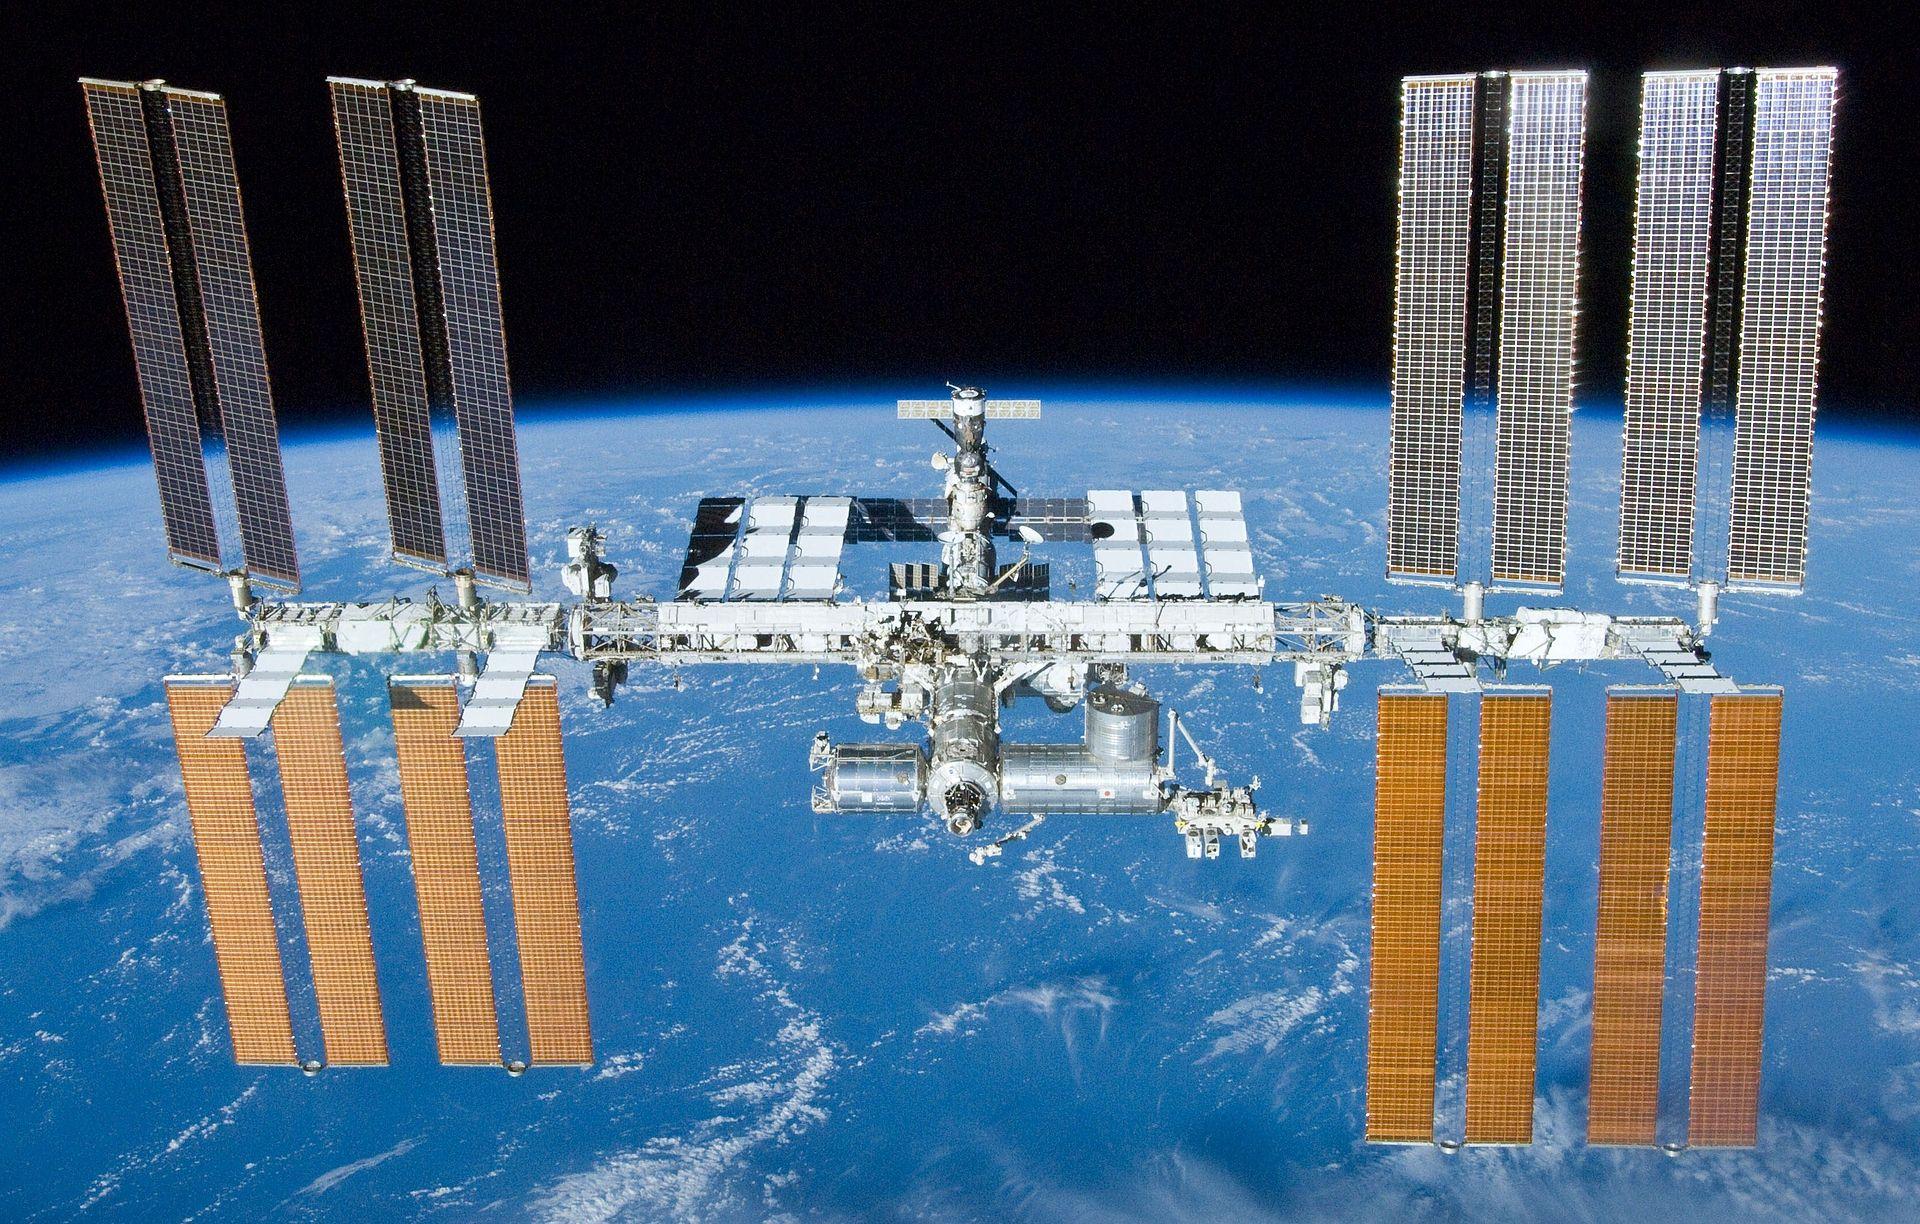 International Space Station, As Seen by Shuttle Atlantis